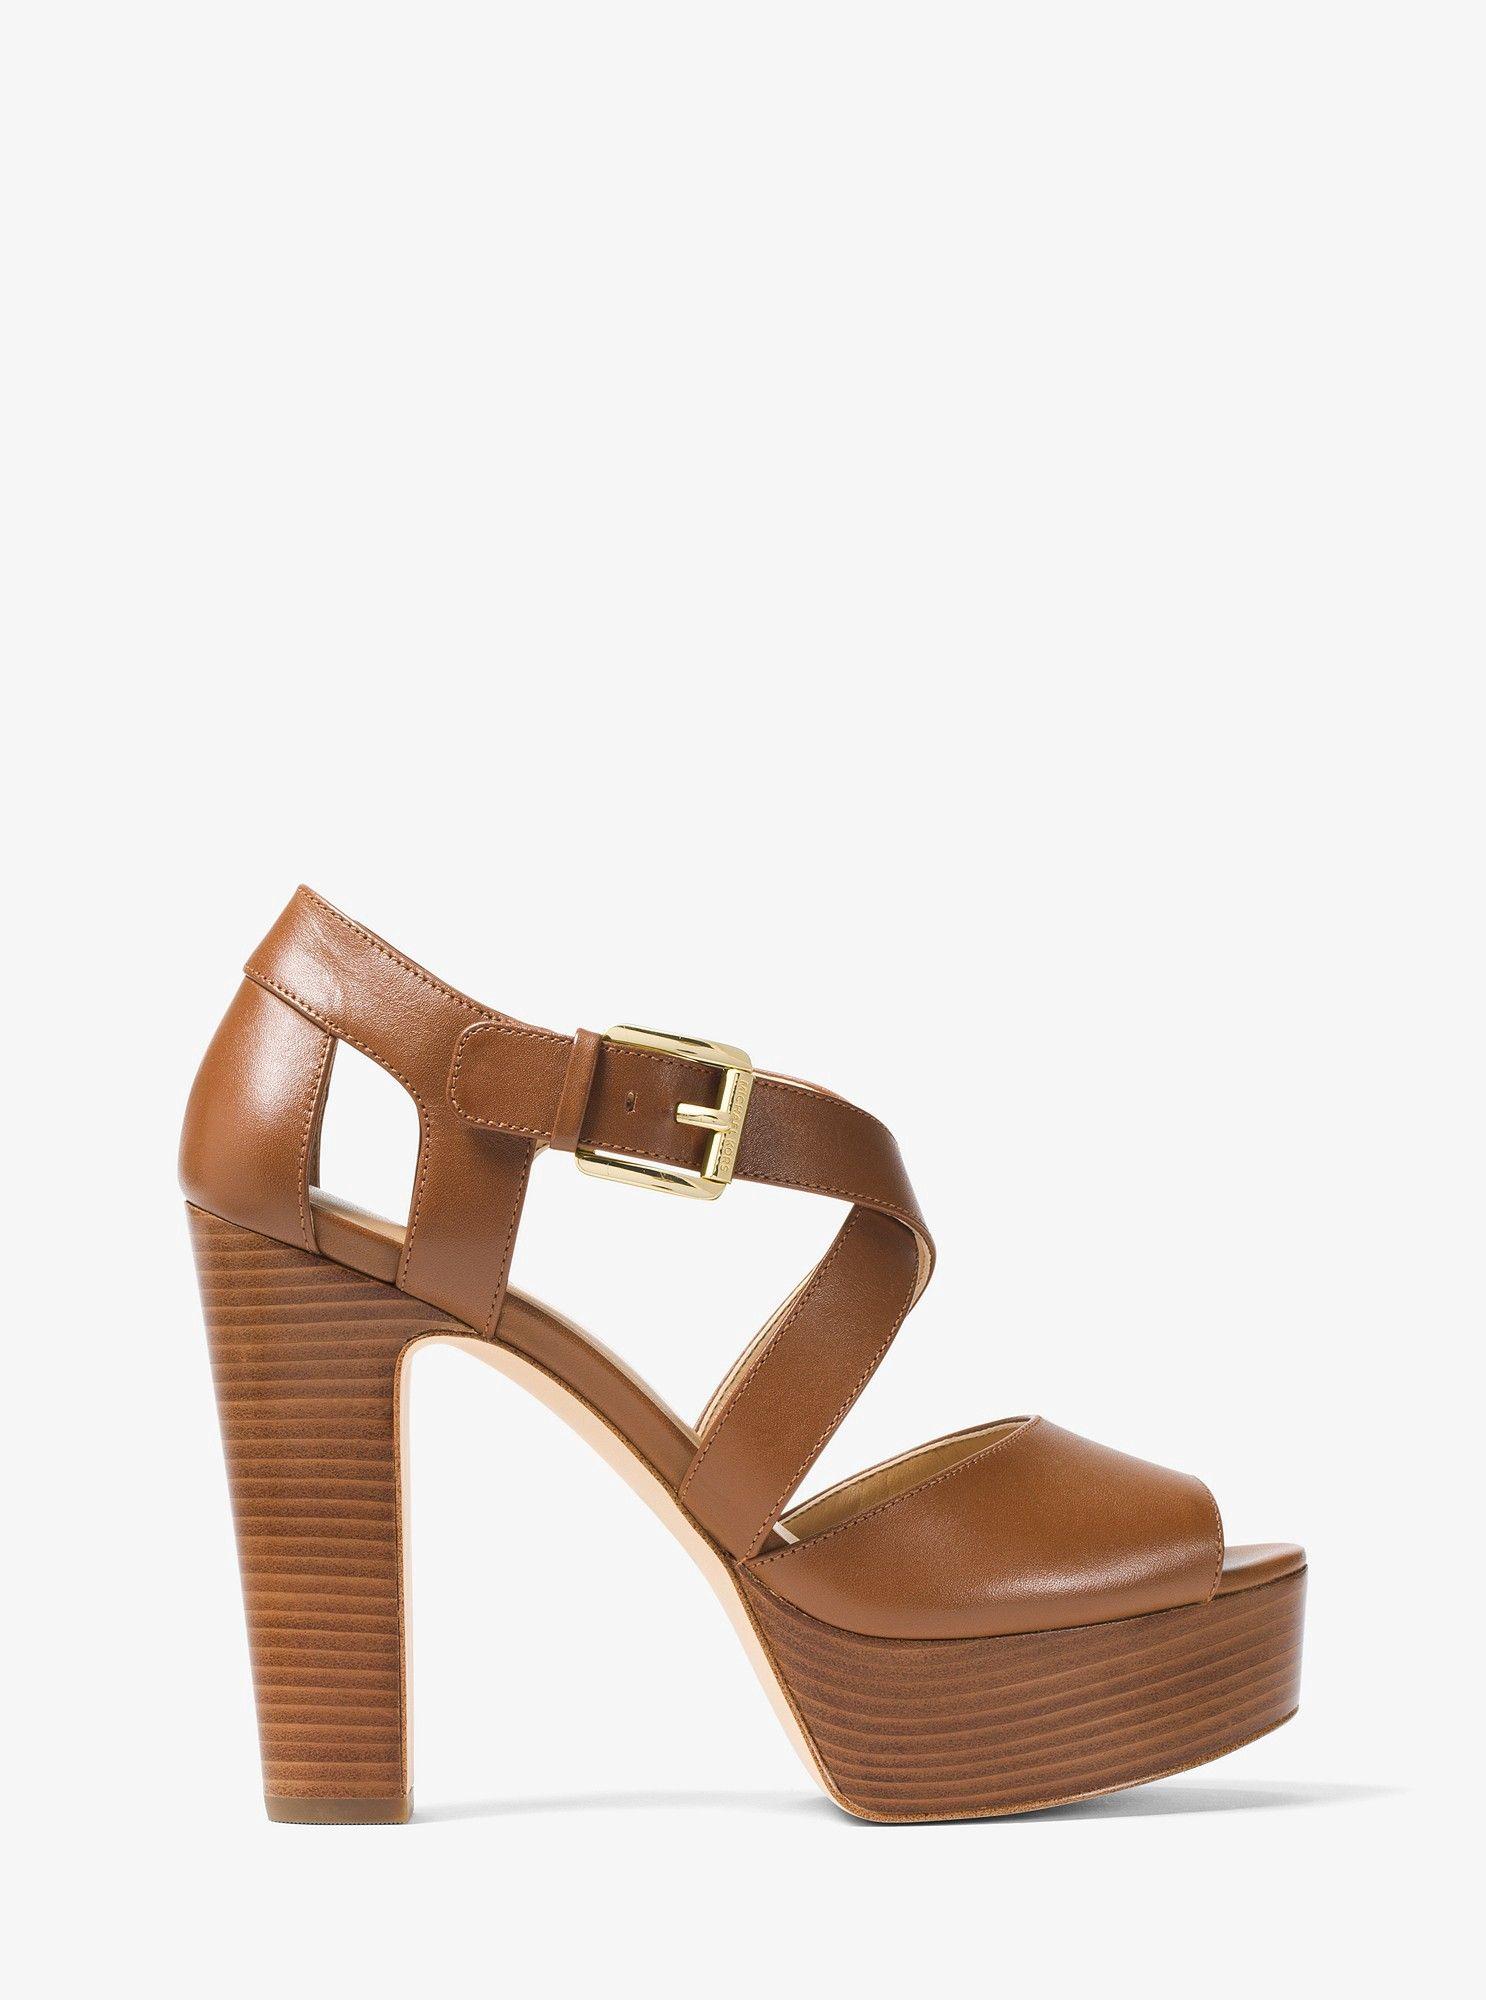 0f34d743a4 Michael Kors Jodi Leather Platform Sandal - 7.5 | Products | Sandals ...